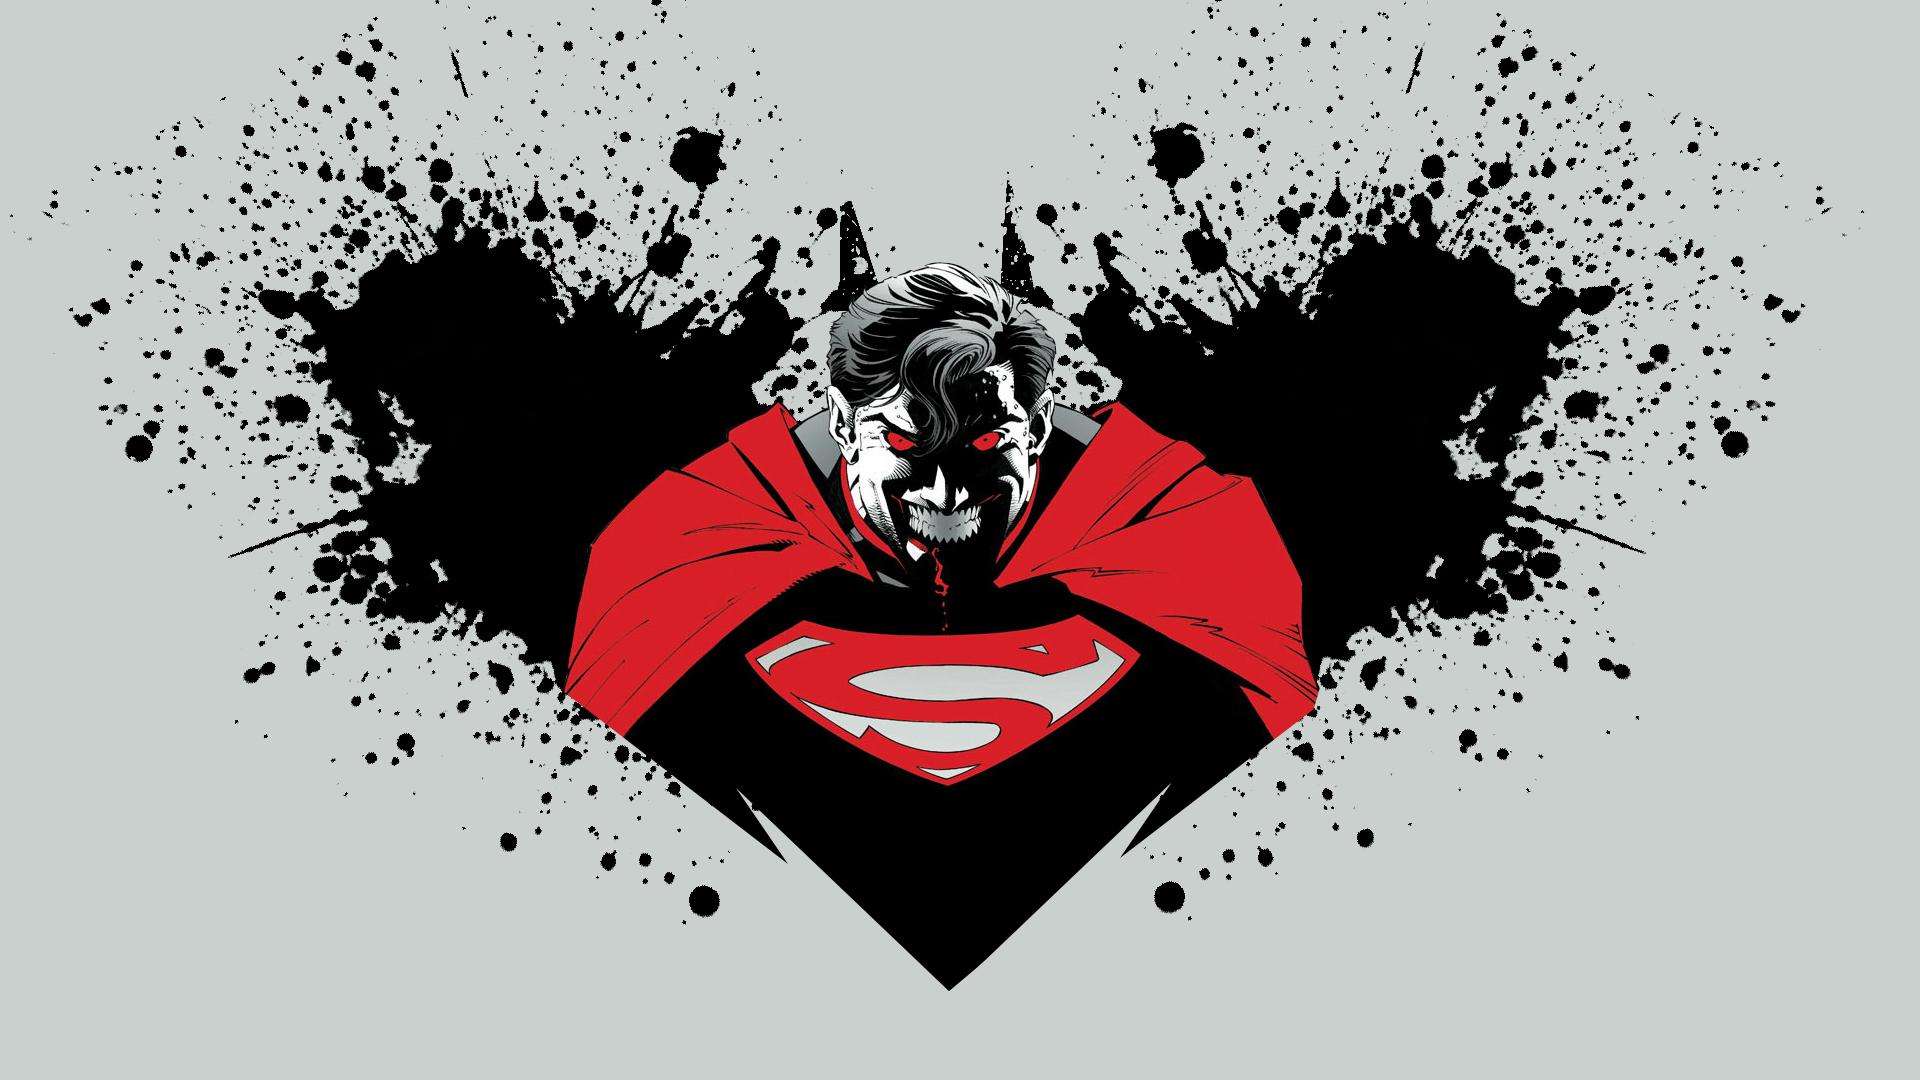 Batman vs superman logo wallpaper 1920 x 1080 by blacklotusxx on batman vs superman logo wallpaper 1920 x 1080 by blacklotusxx voltagebd Gallery